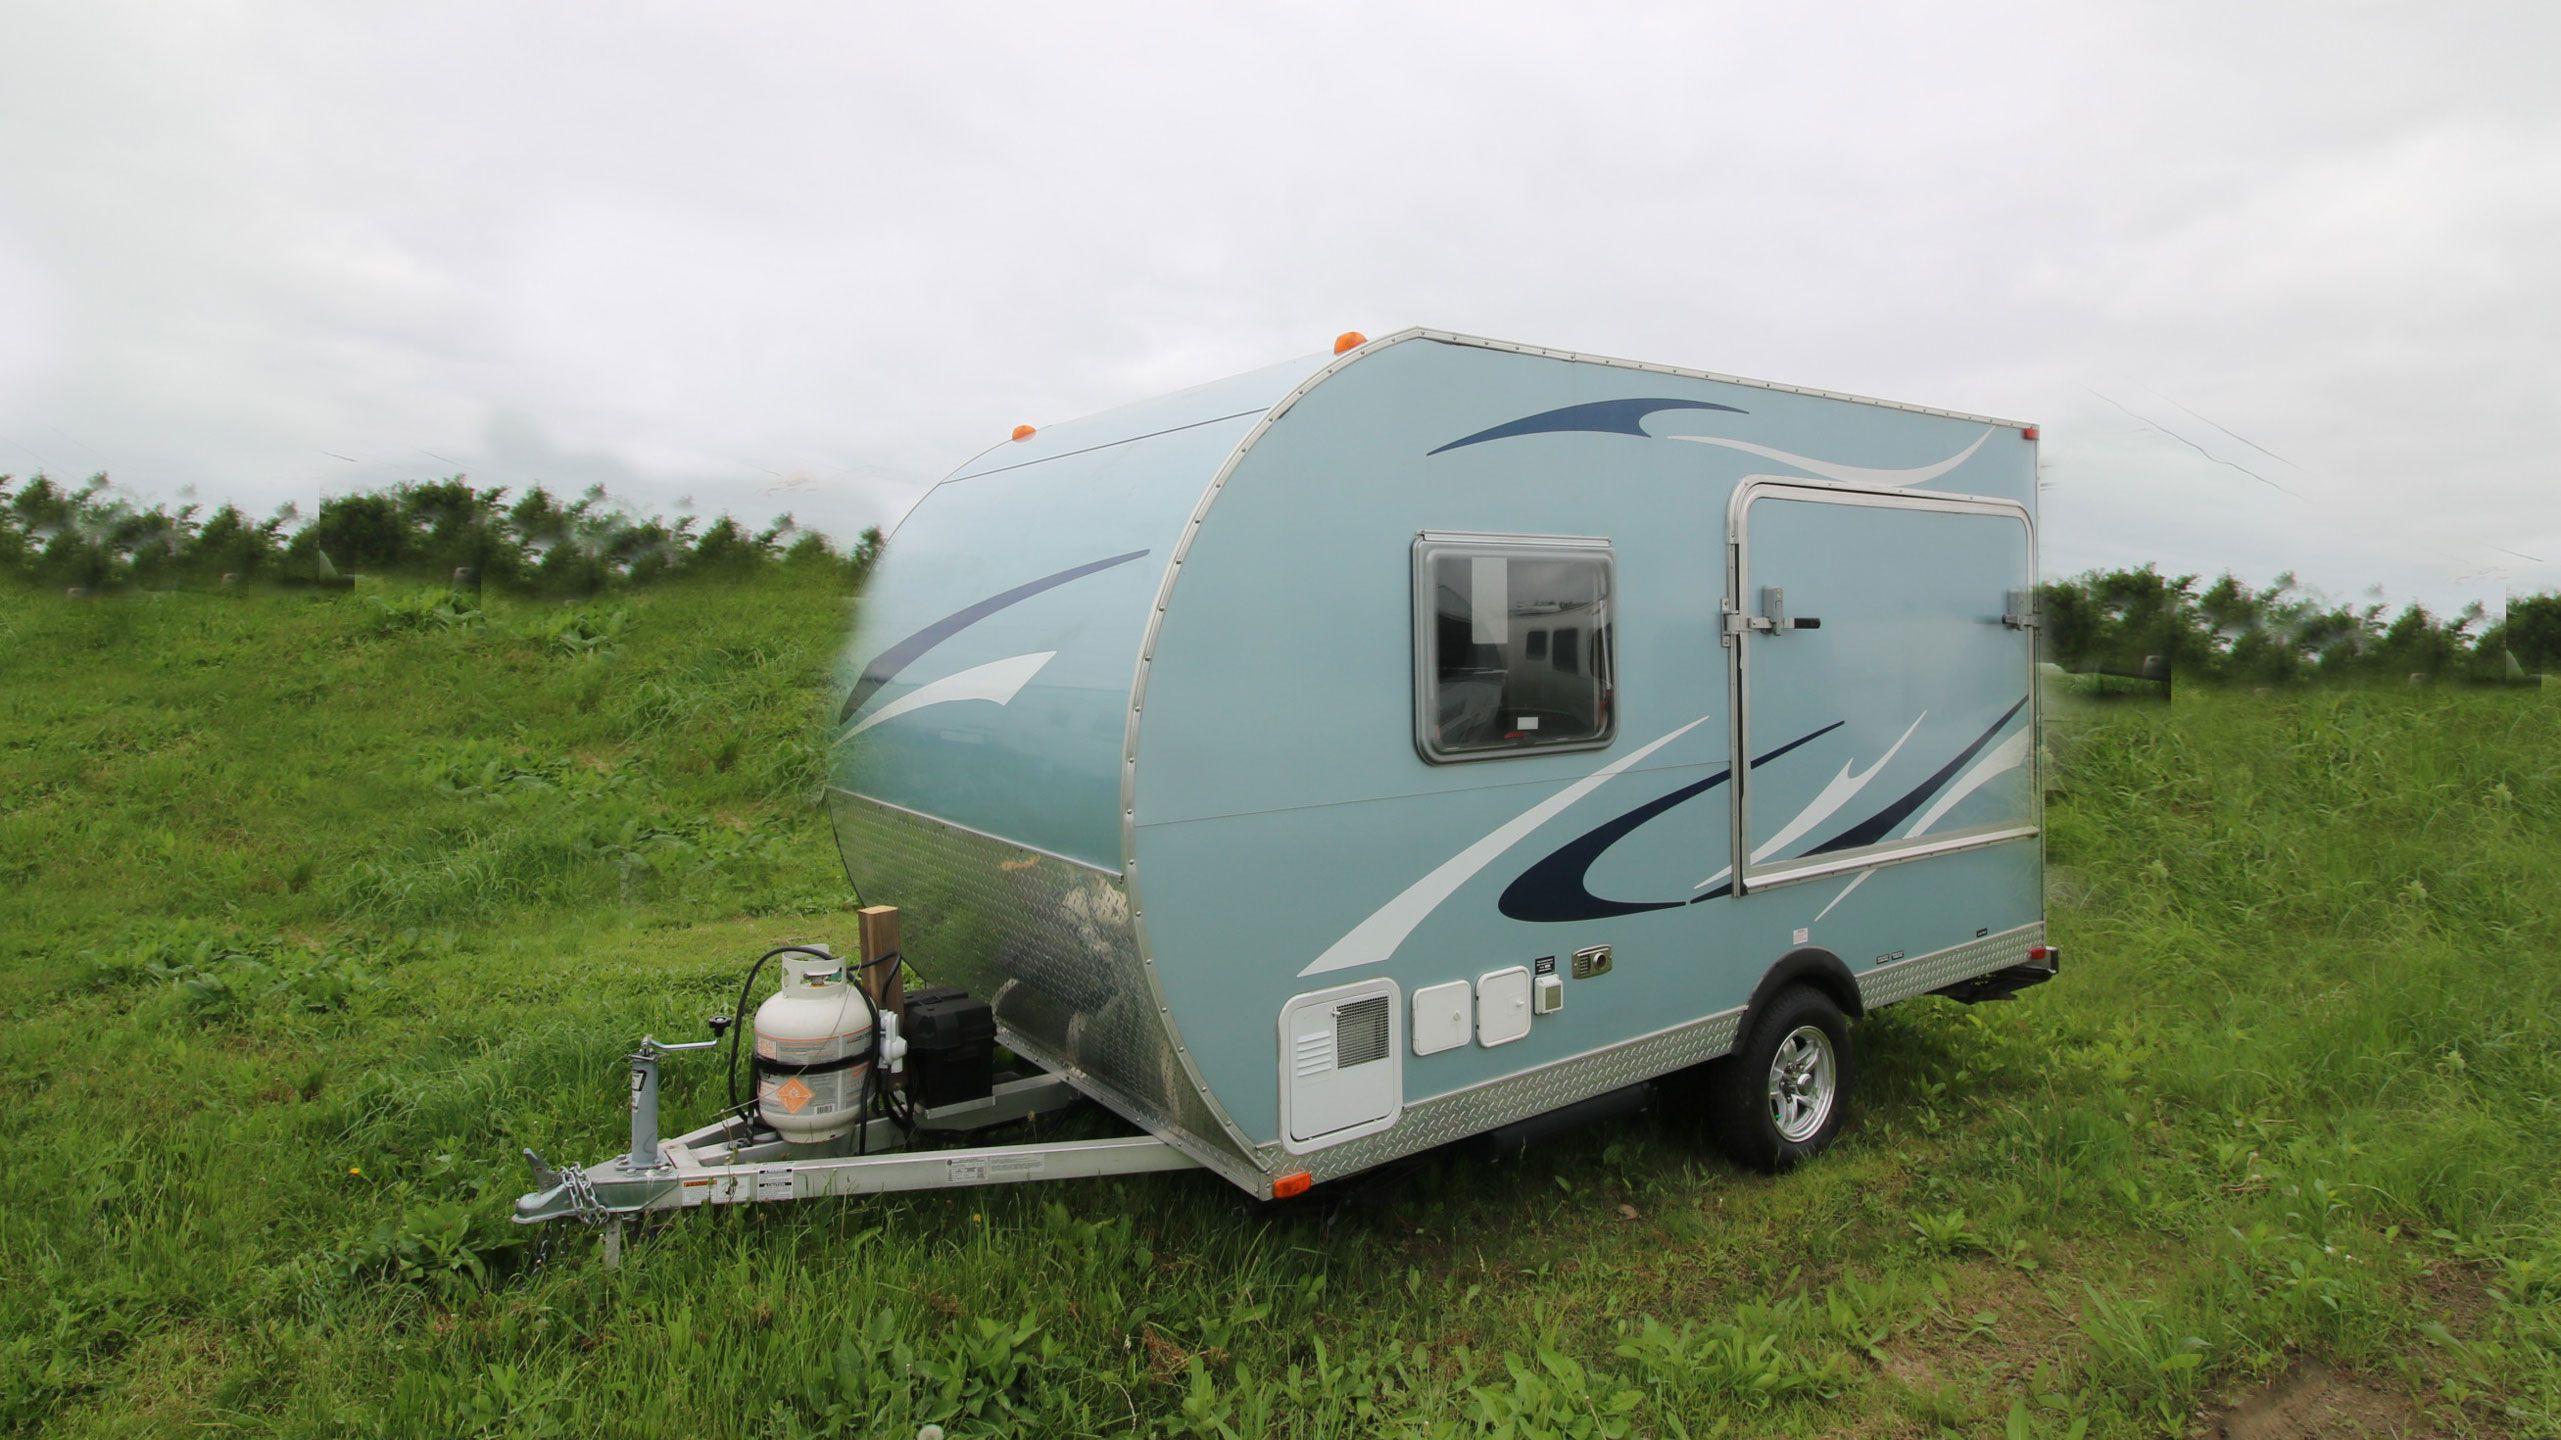 Used Livin Lite Travel trailers for sale - TrailersMarket.com